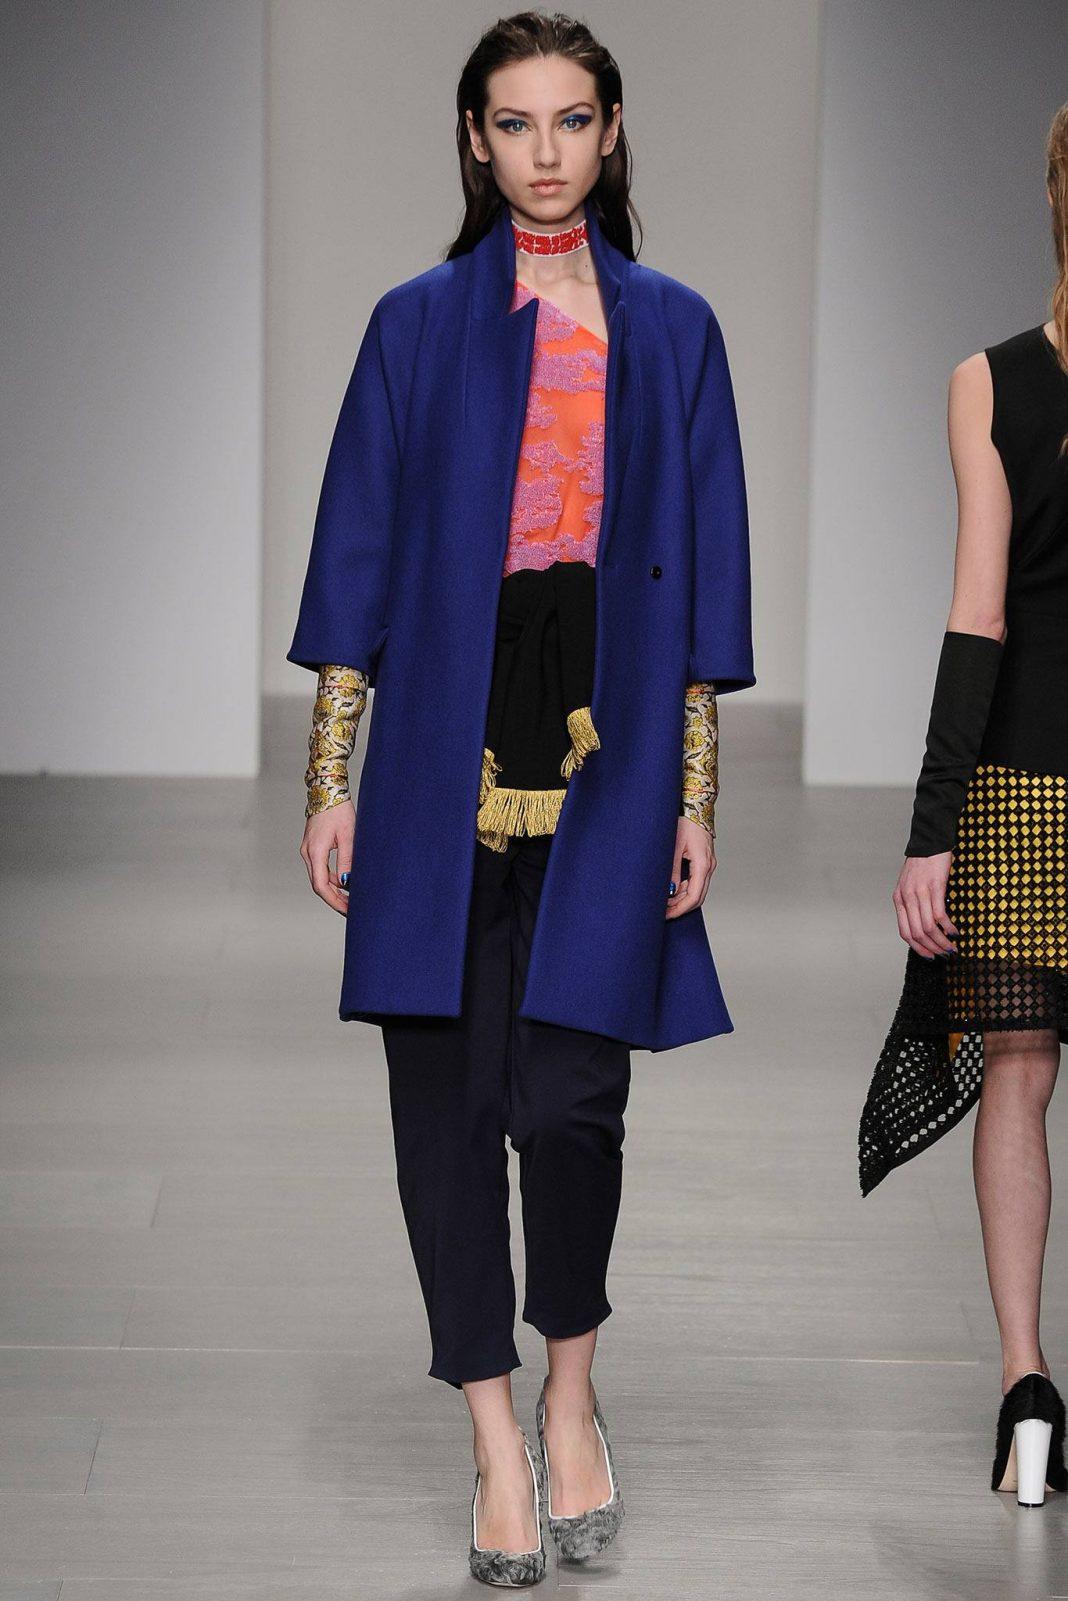 https://ratatum.com/wp-content/uploads/2017/10/Osman-Fall-Winter-2014-2015-Fashion-Advices-7-1068x1601.jpg